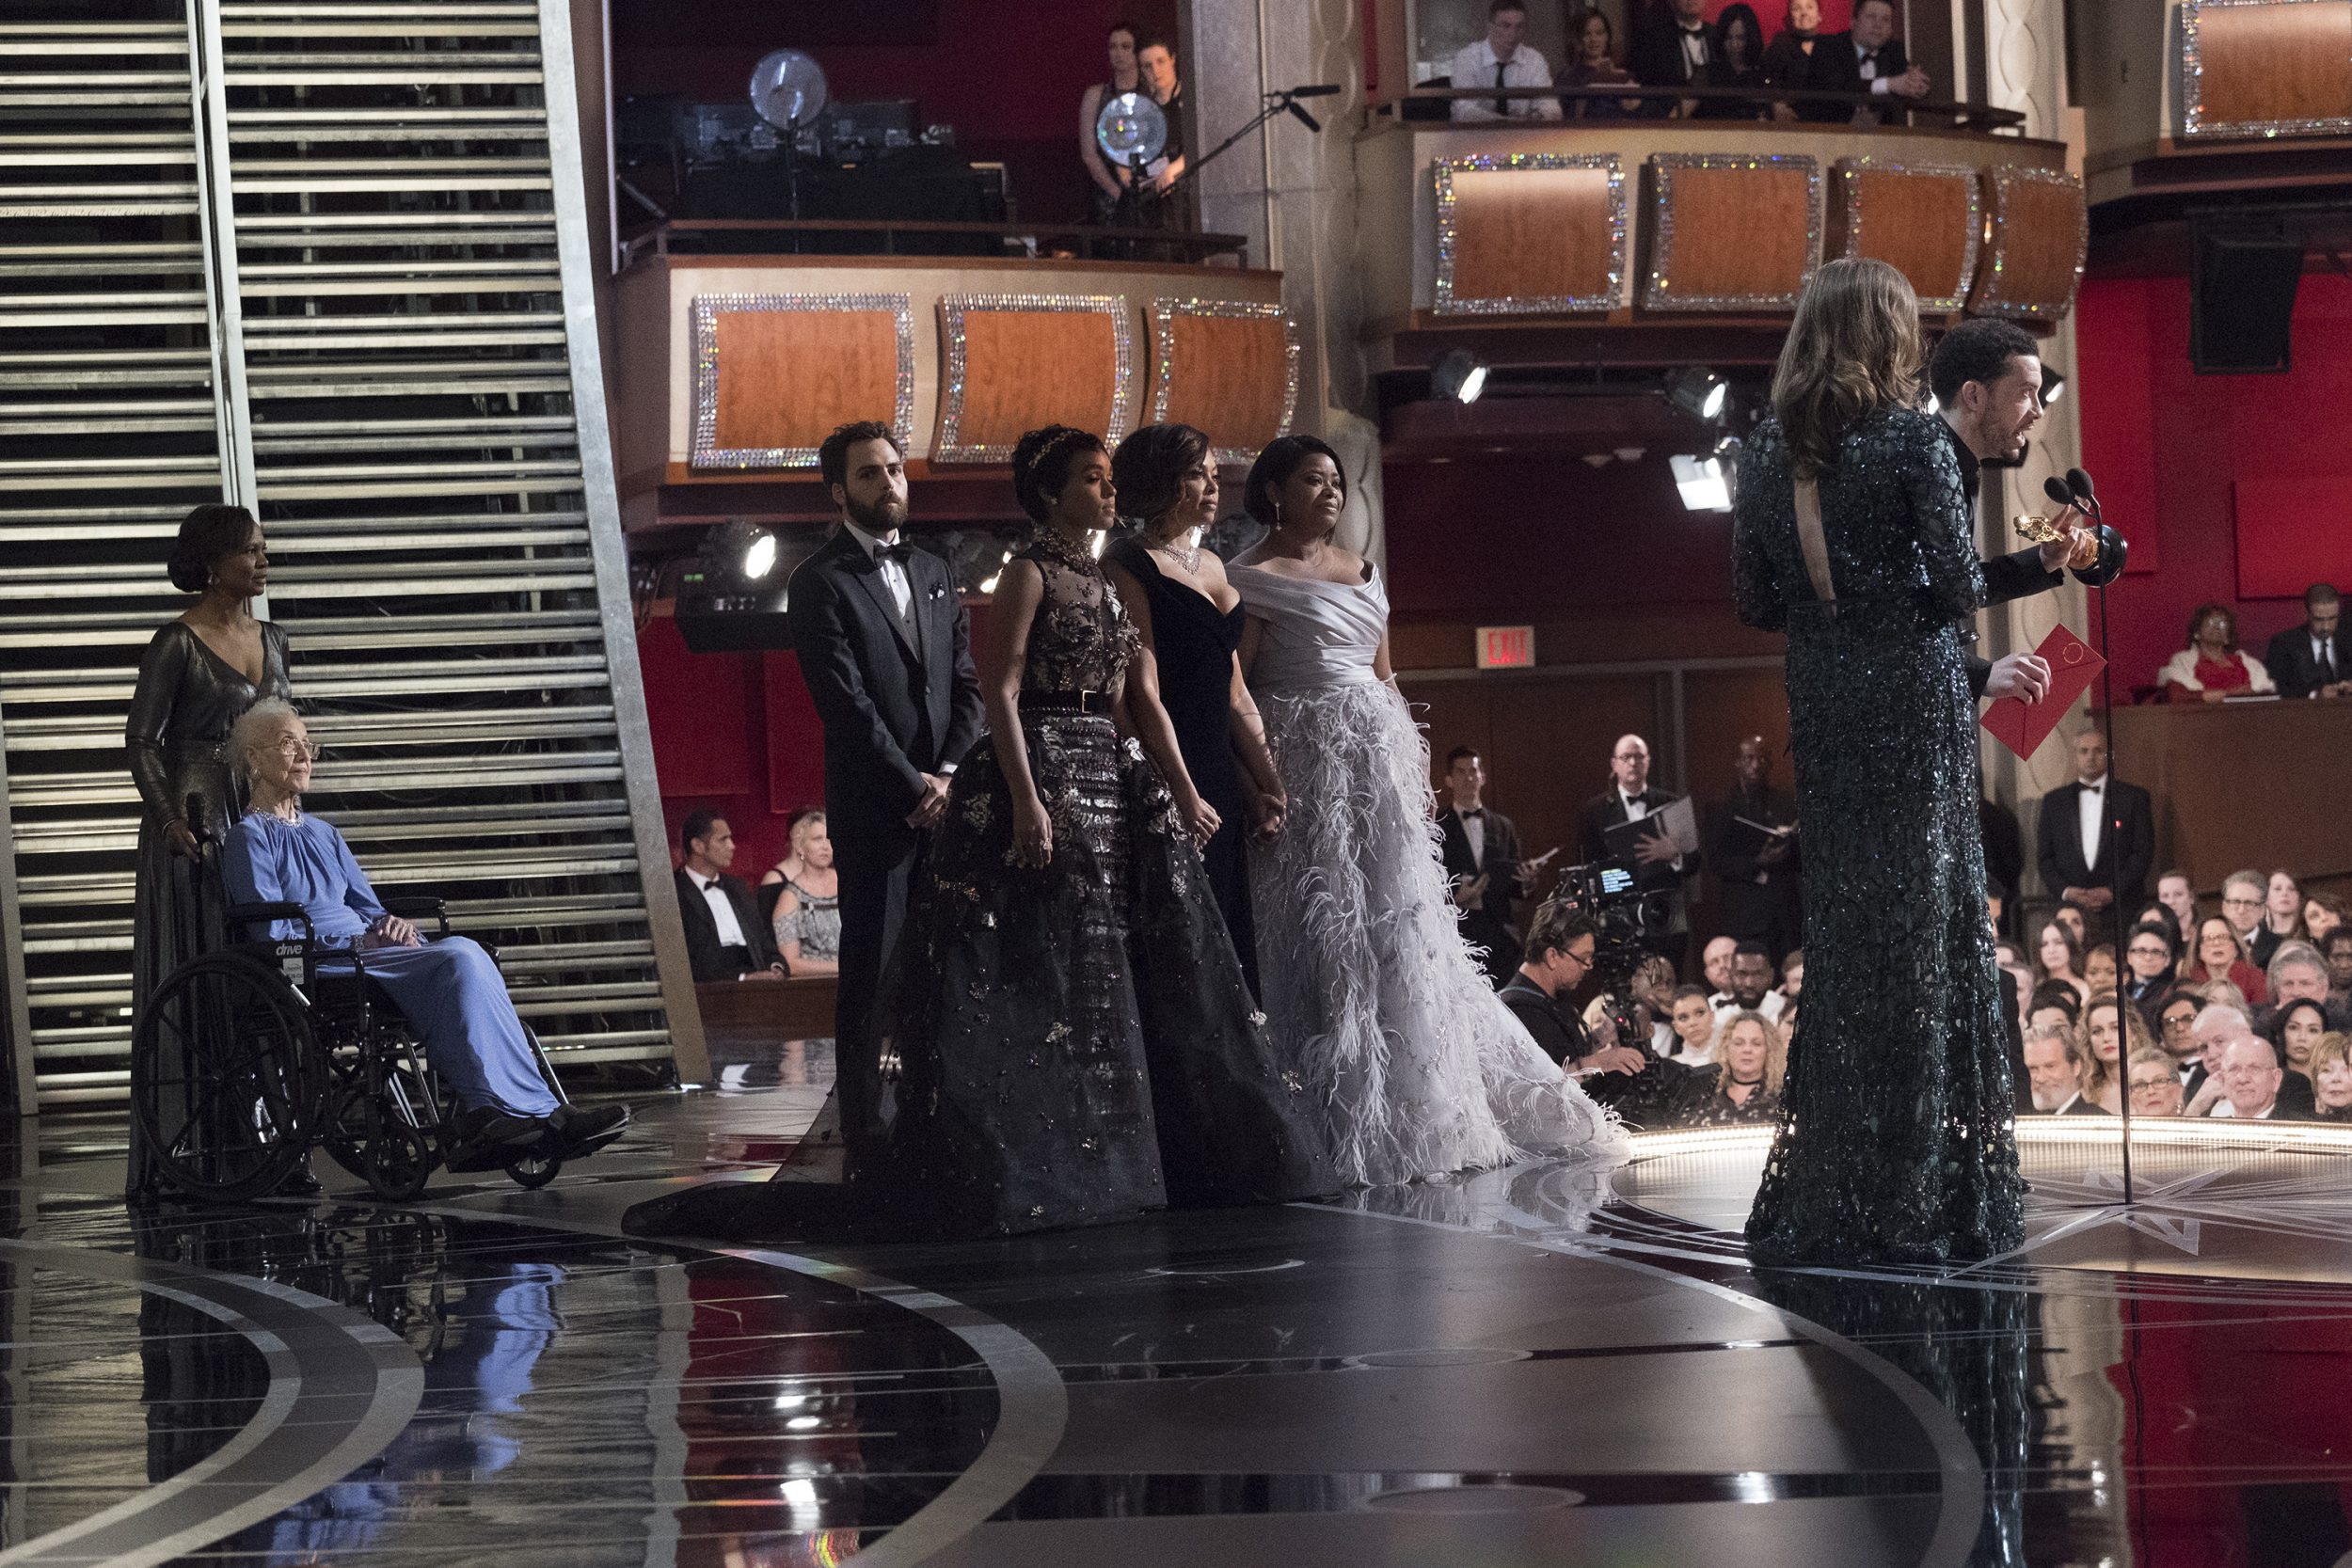 THE OSCARS(r) - The 89th Oscars(r)  broadcasts live on Oscar(r) SUNDAY, FEBRUARY 26, 2017, on the ABC Television Network. (ABC/Adam Rose) DR. YVONNE CAGLE, KATHERINE JOHNSON, JANELLE MONAE, TARAJI P. HENSON, OCTAVIA SPENCER, CAROLINE WATERLOW, EZRA EDELMAN